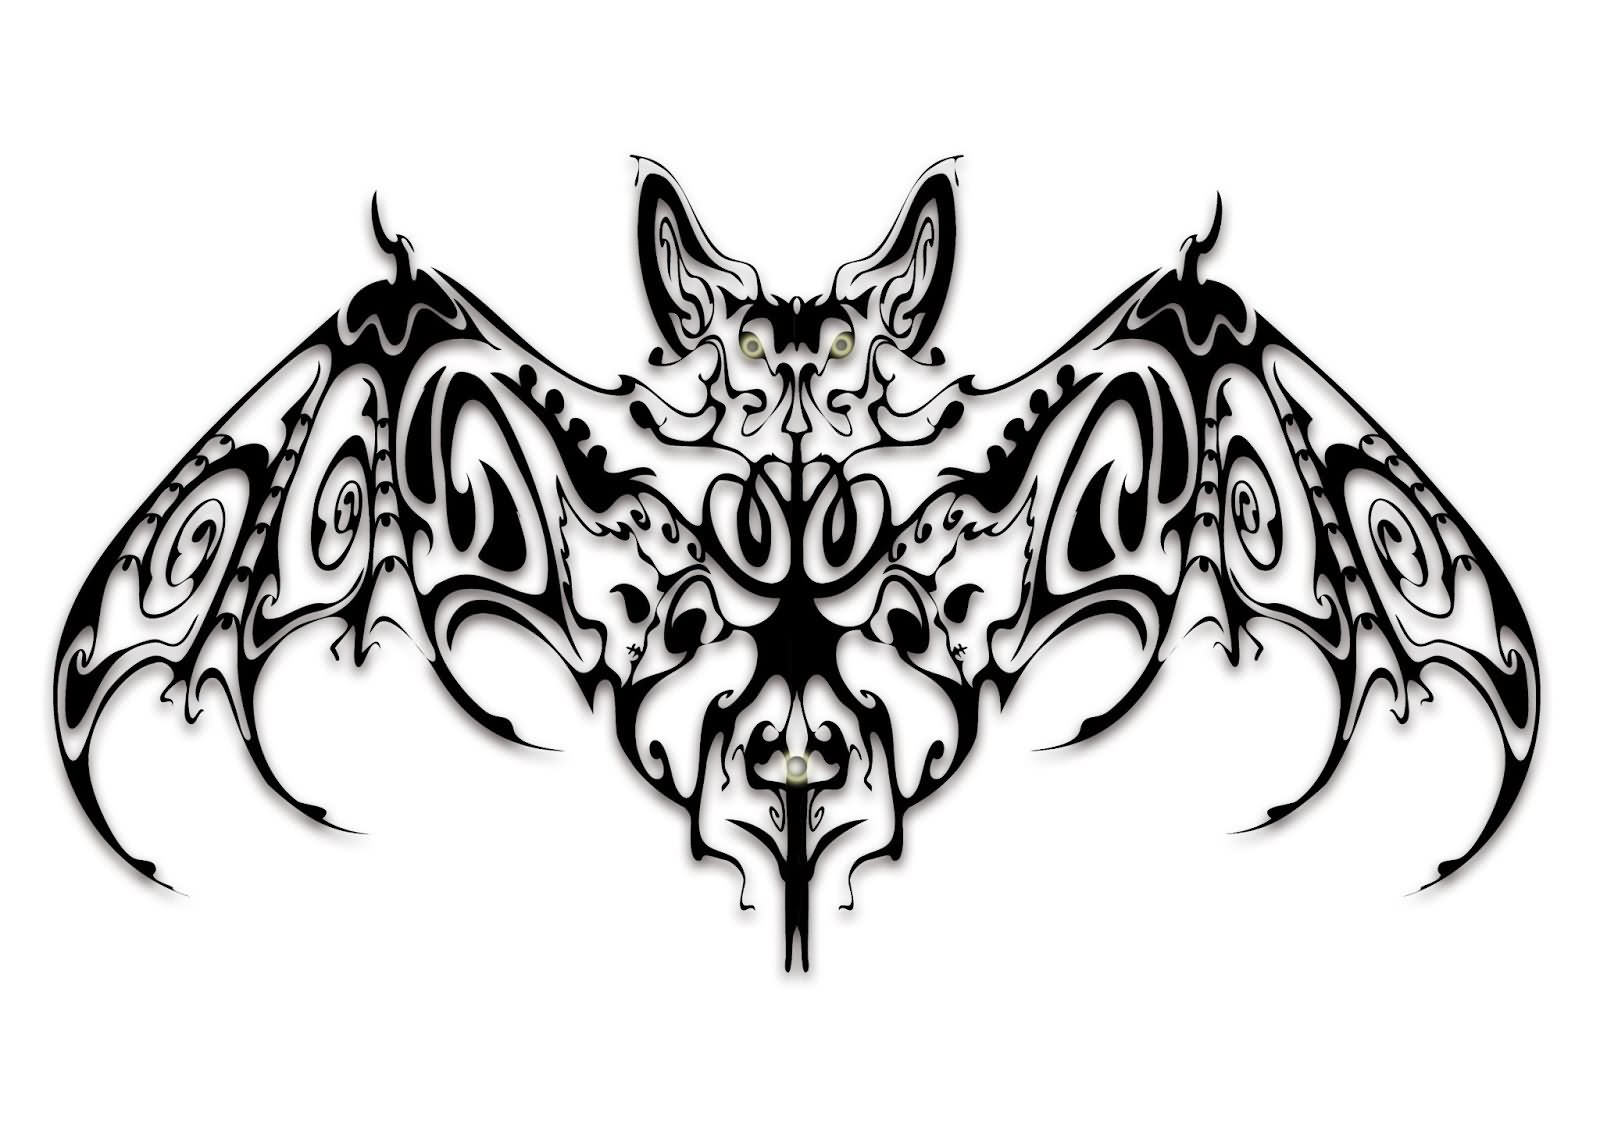 16 Vampire Bat Tattoo Design Ideas